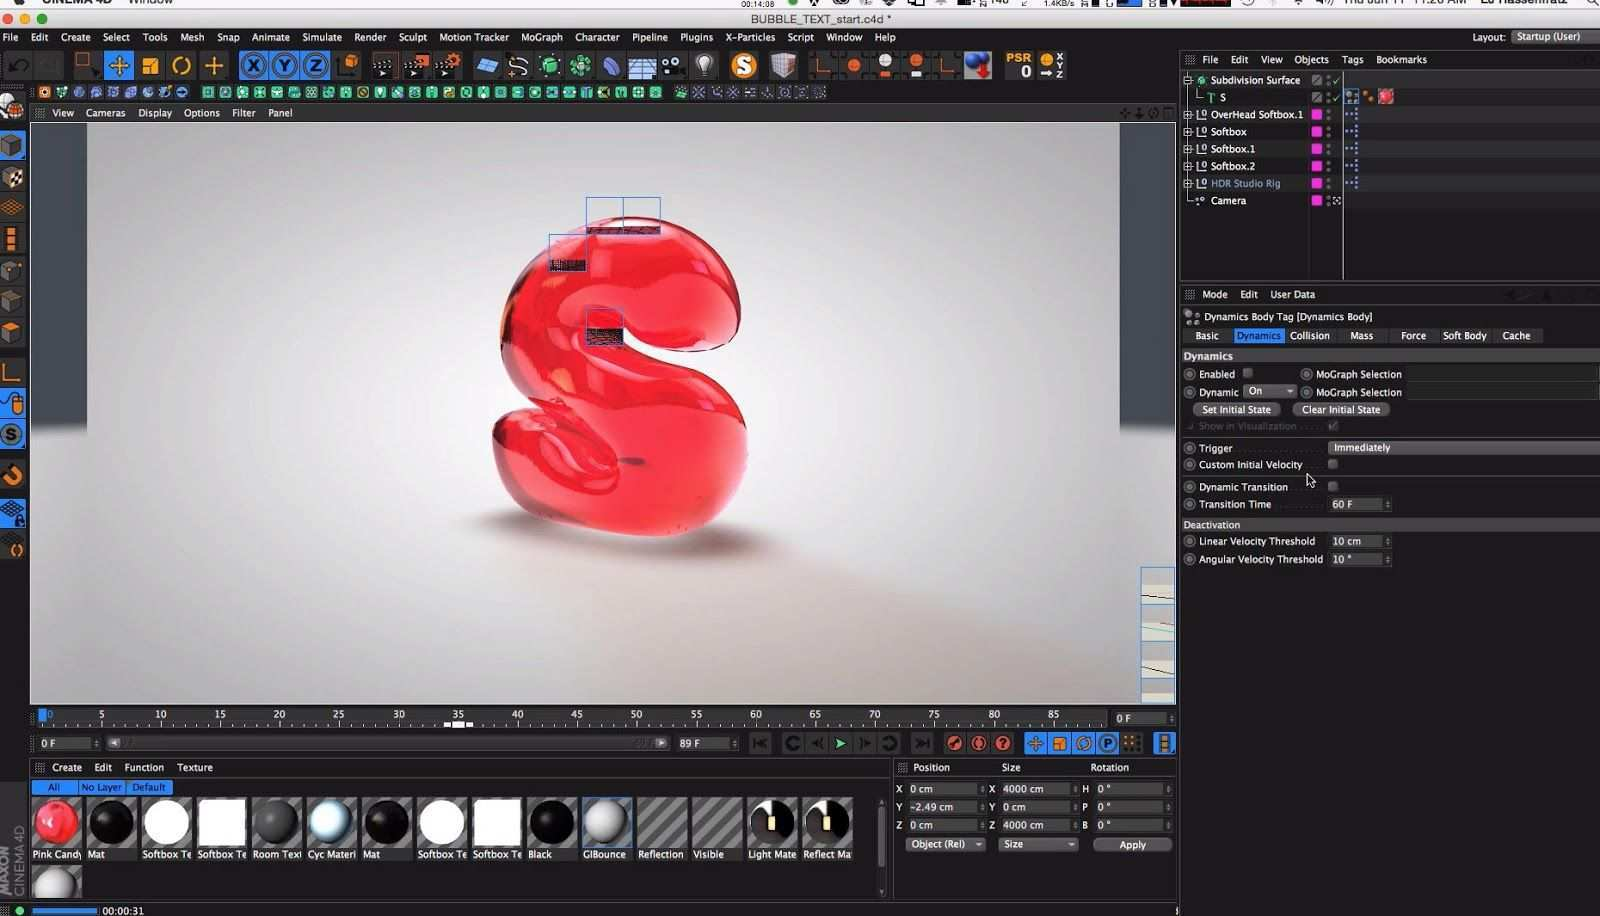 Creating Bubble Text In Cinema 4d Cg Tutorials Library Cinema 4d Cinema 4d Tutorial Cinema 4d Materials